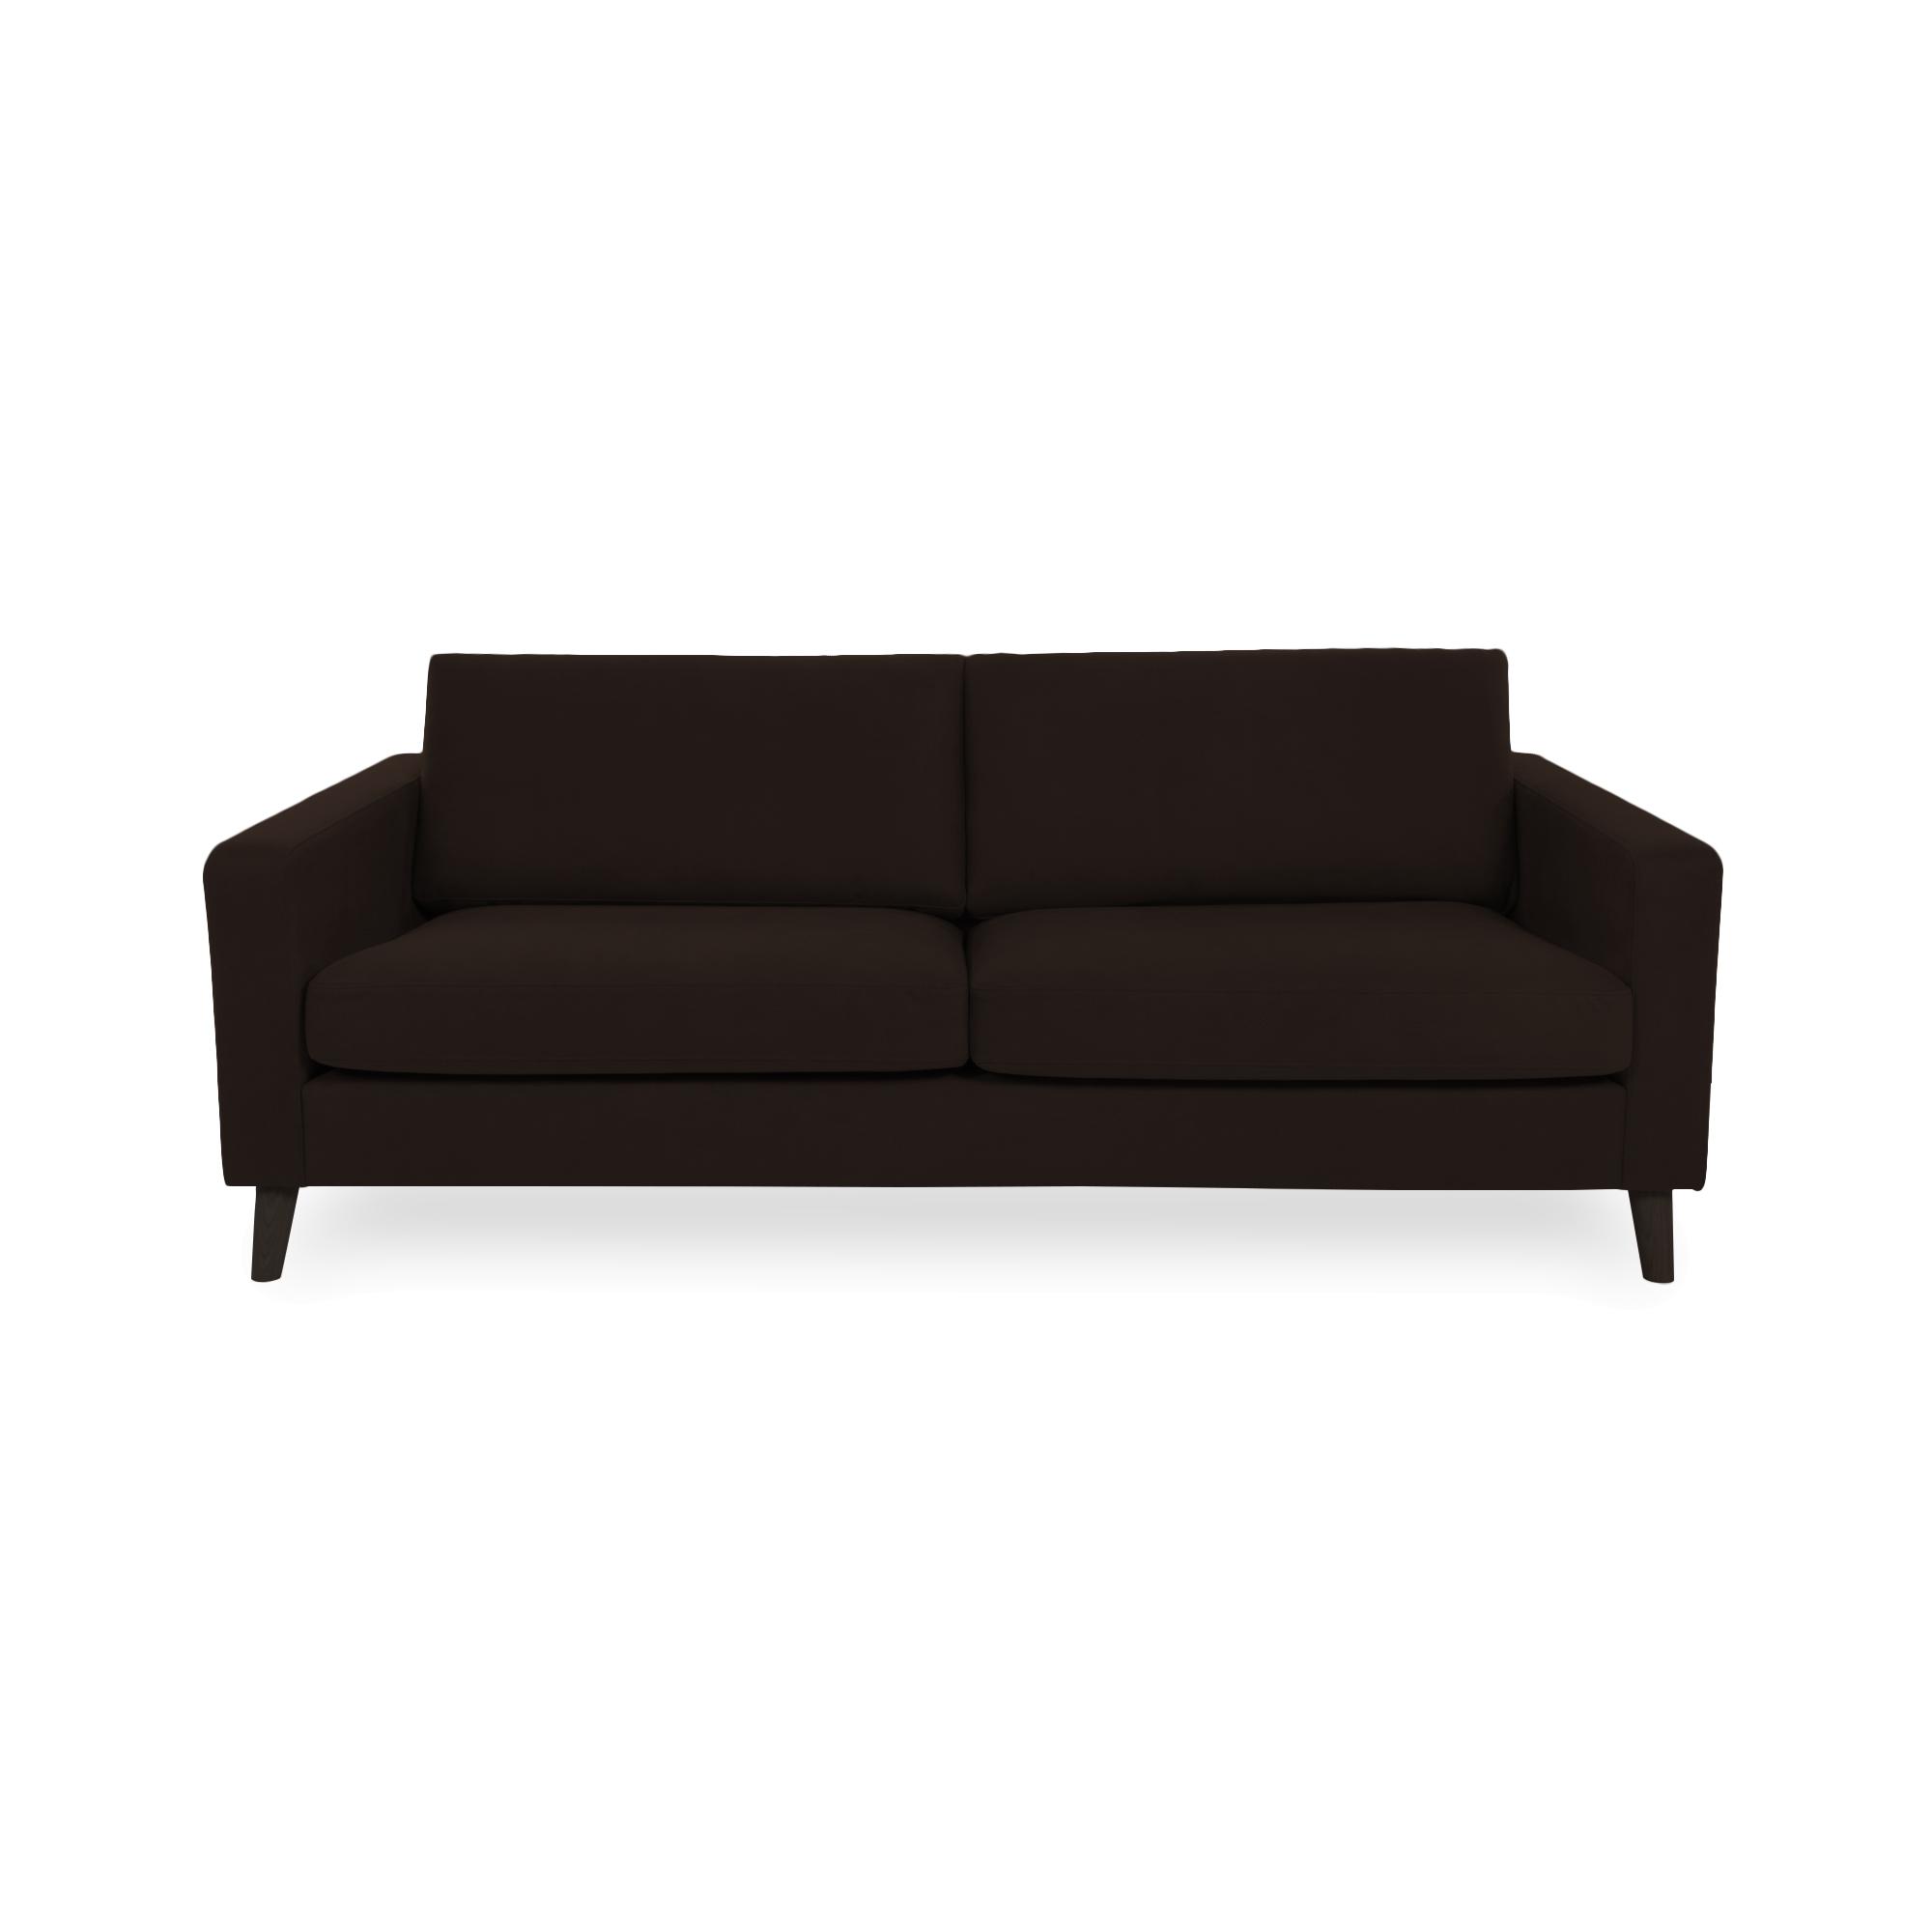 Canapea Fixa 3 locuri Tom Brown/Black